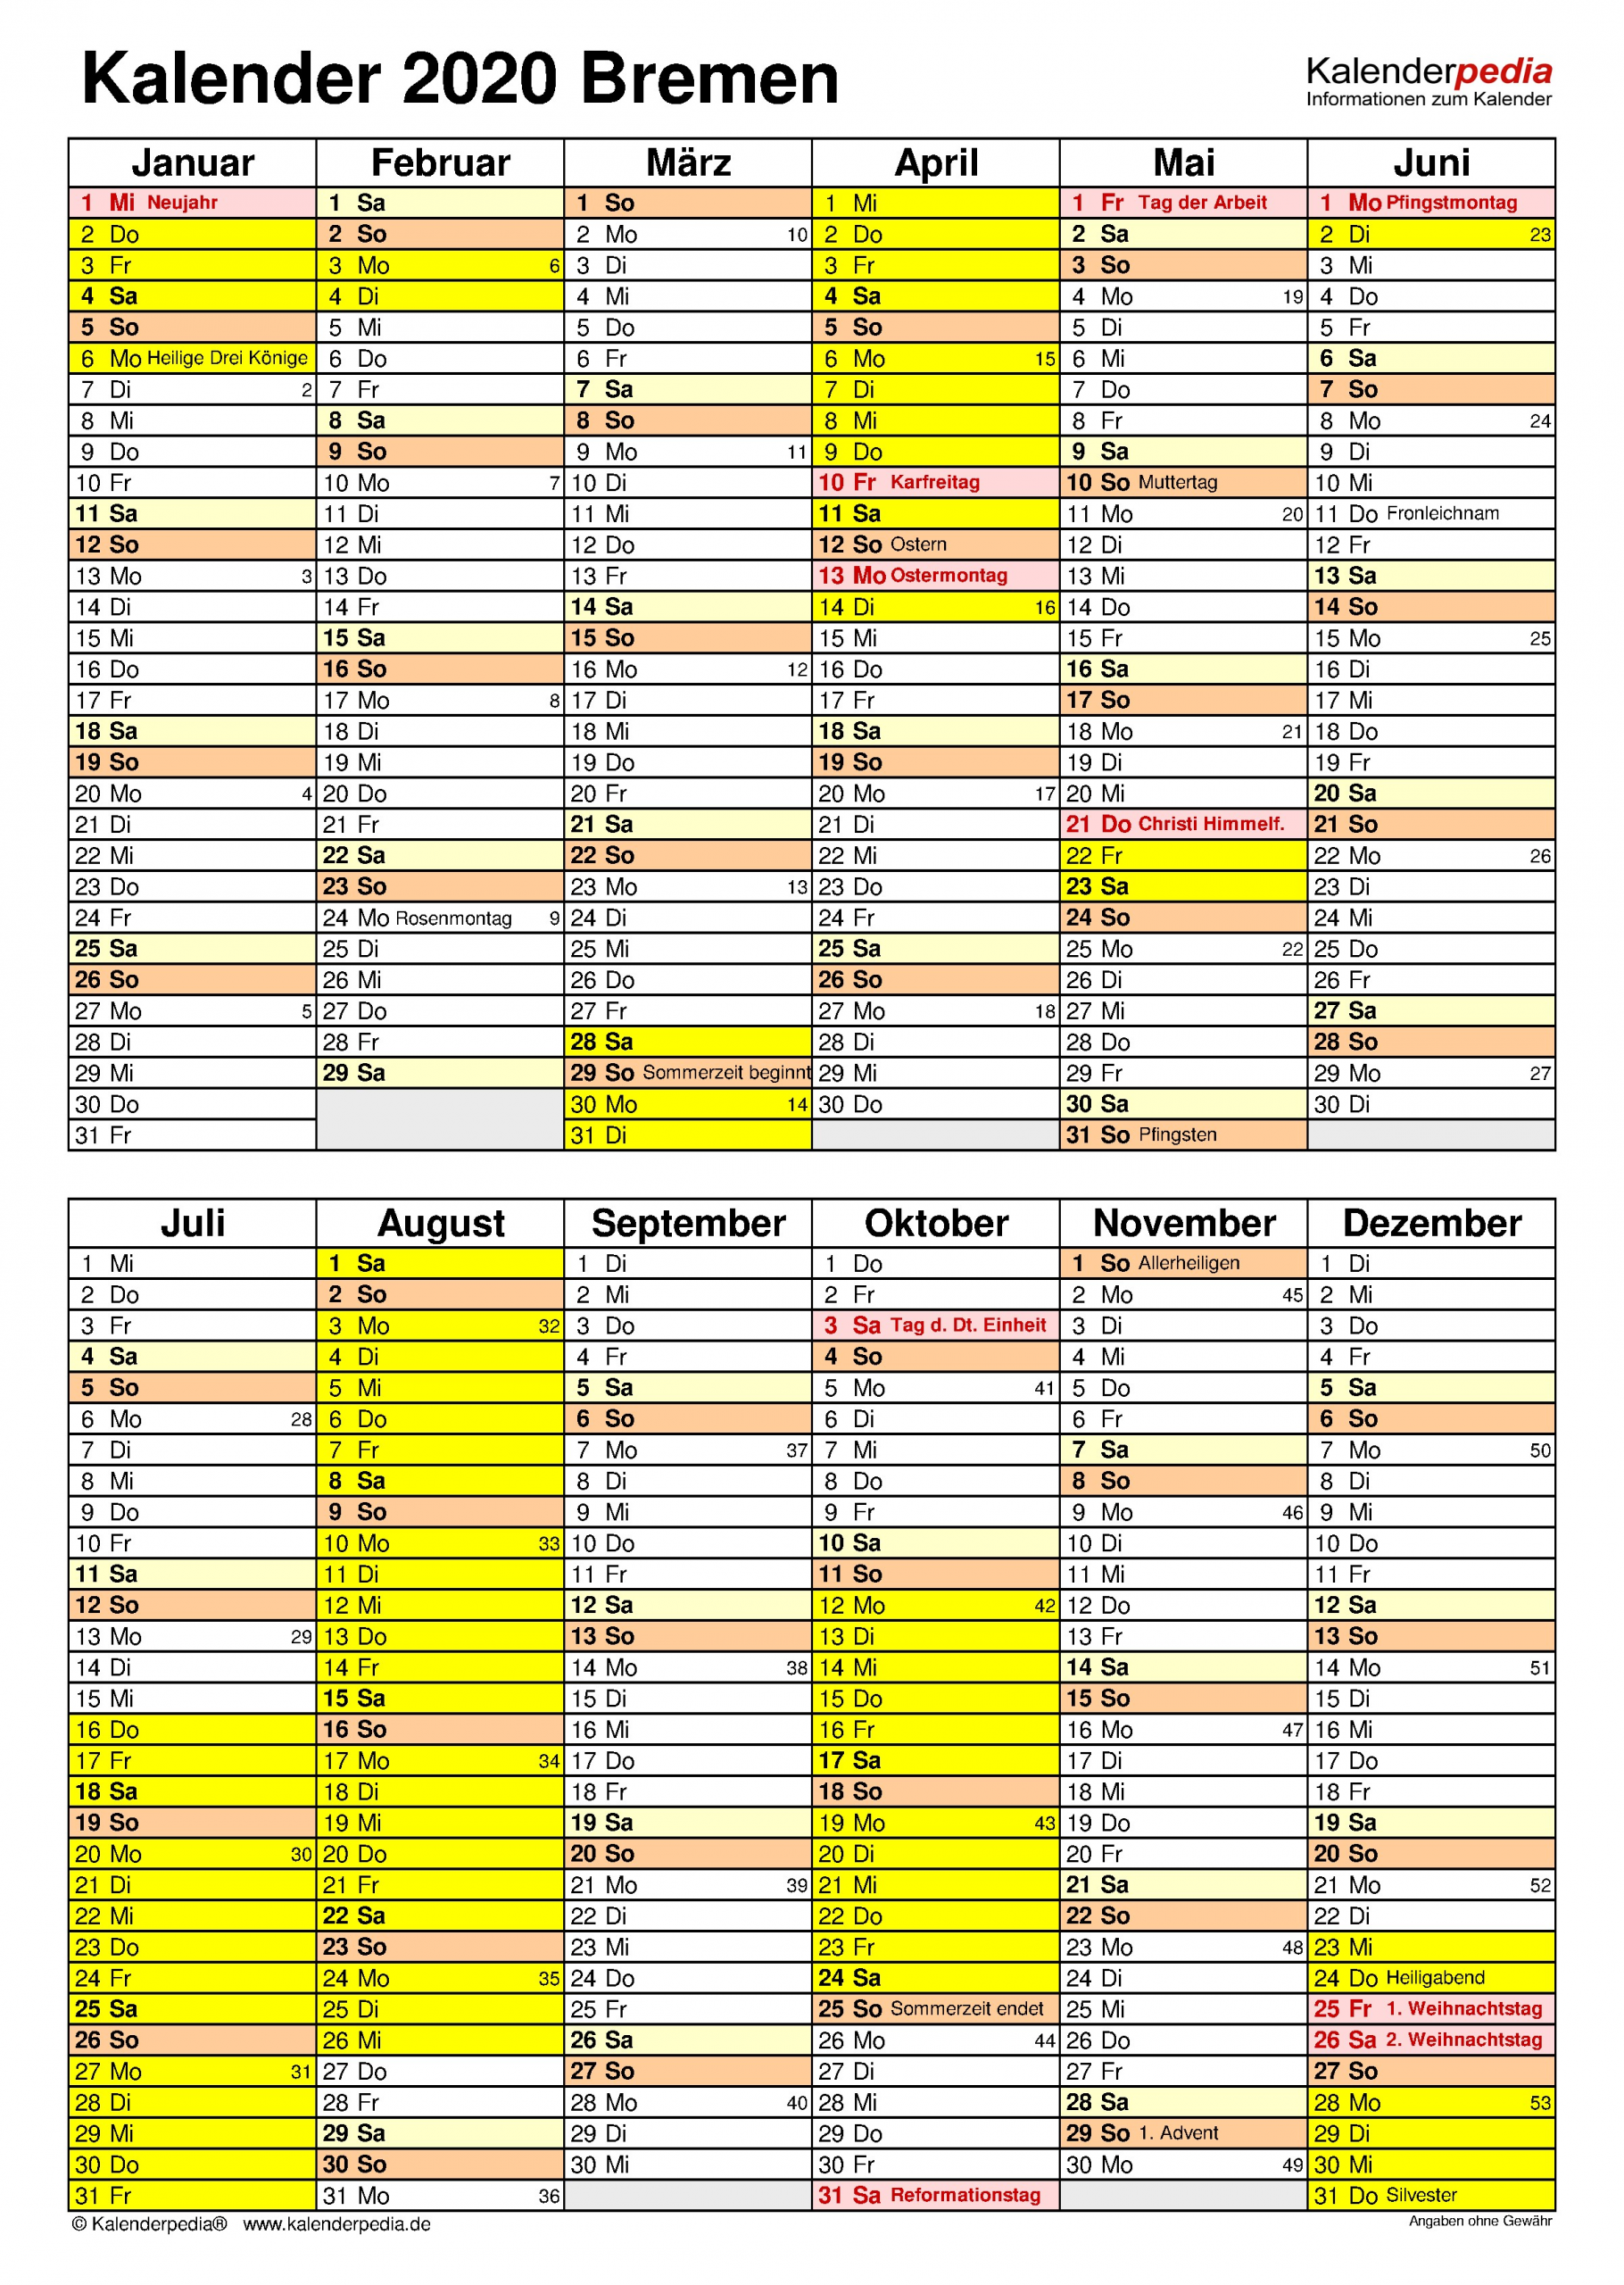 kalender 2020 bremen hochformat